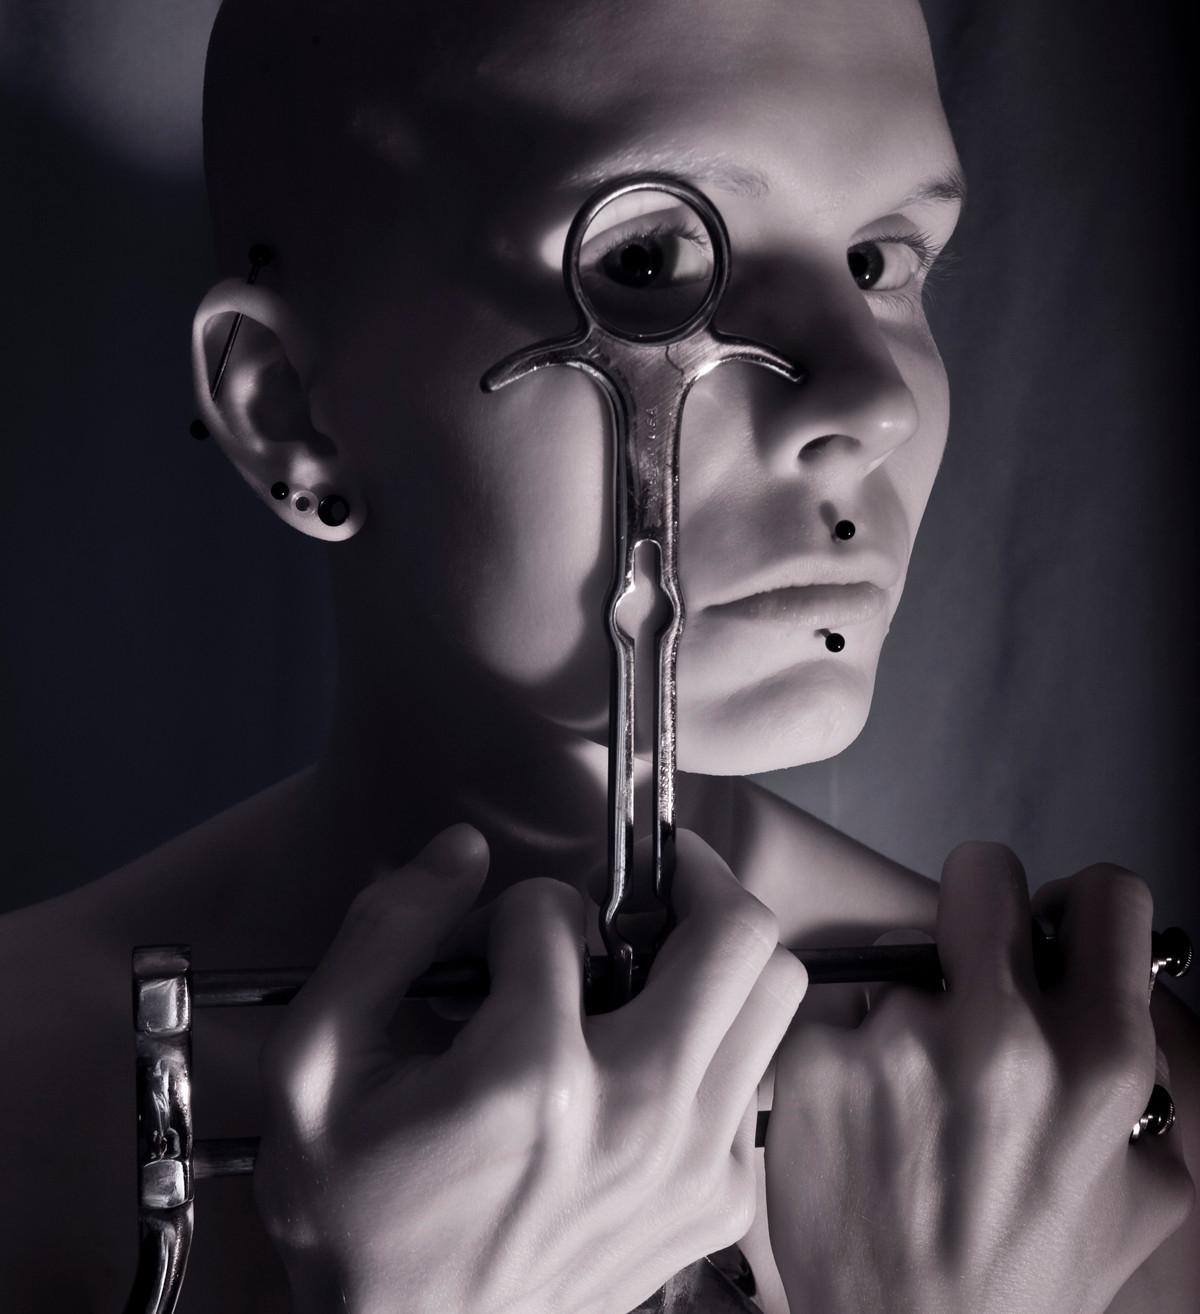 Mental Slavery VIII